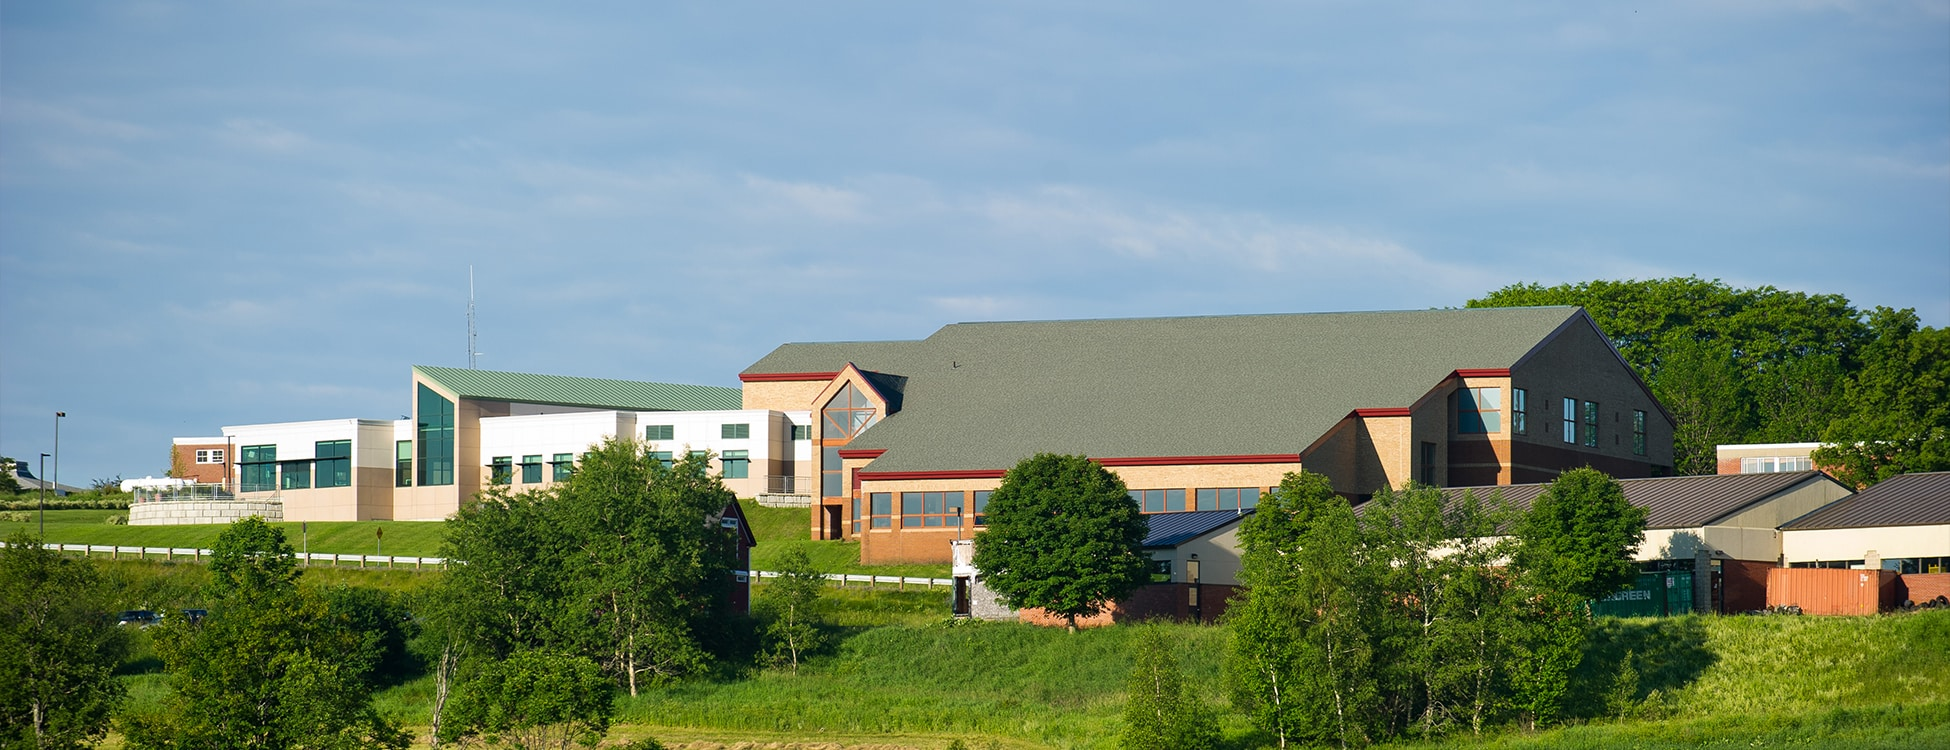 SHAPE building, Randolph Center campus